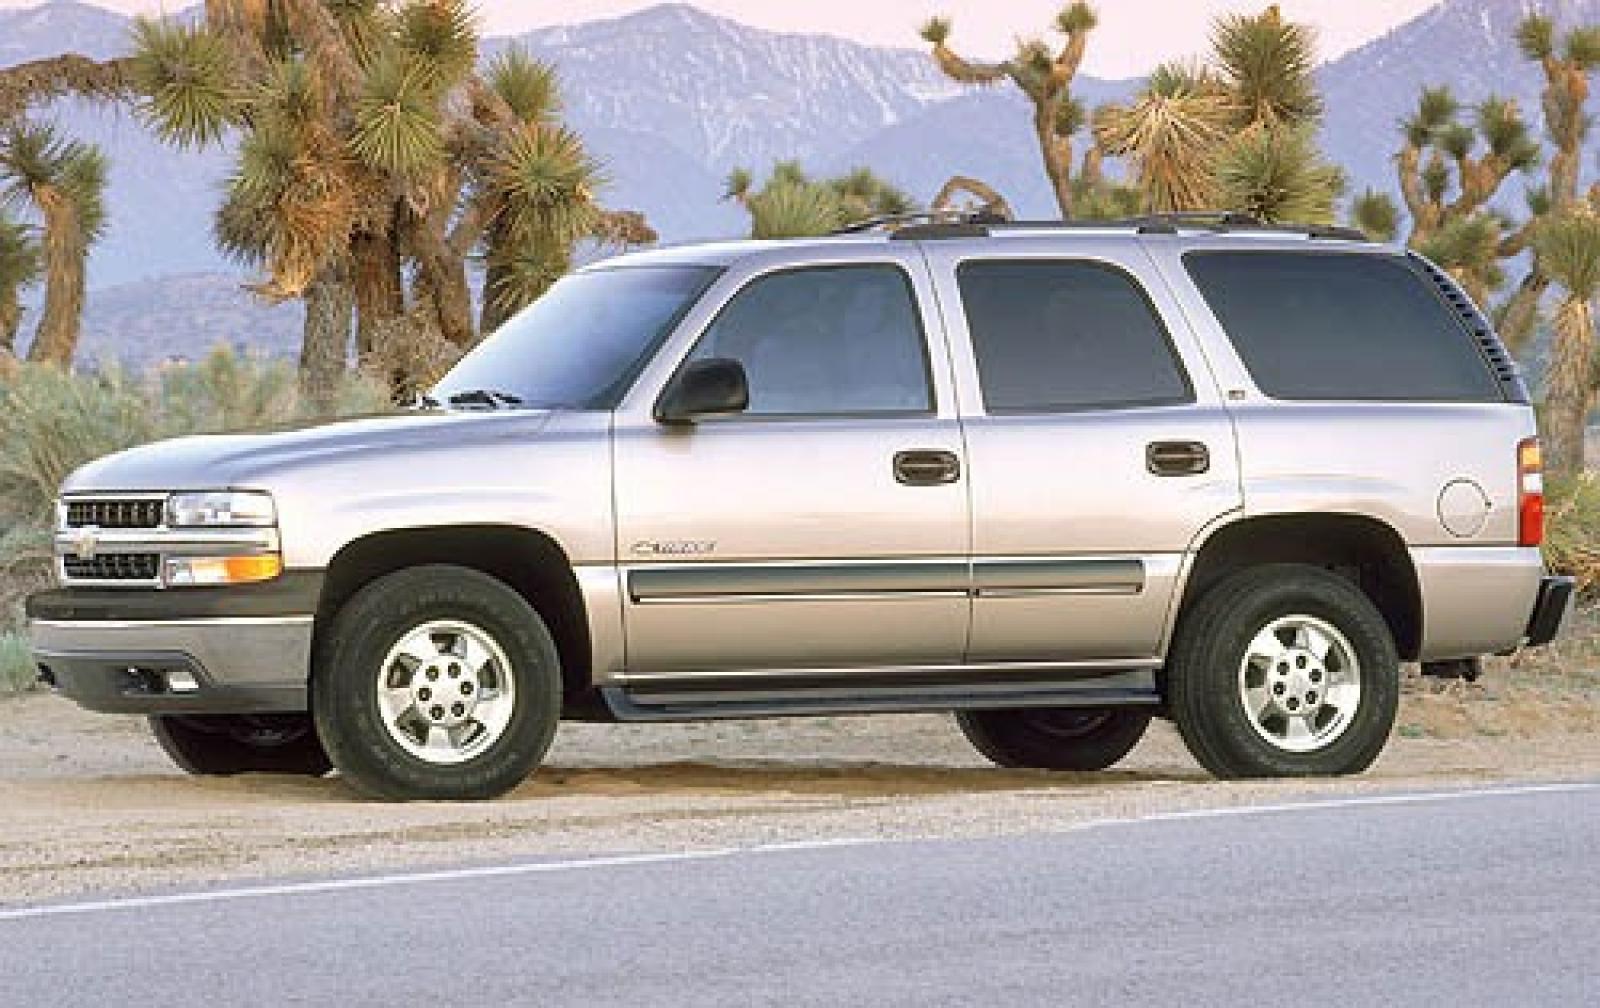 2006 chevrolet tahoe 1 800 1024 1280 1600 origin